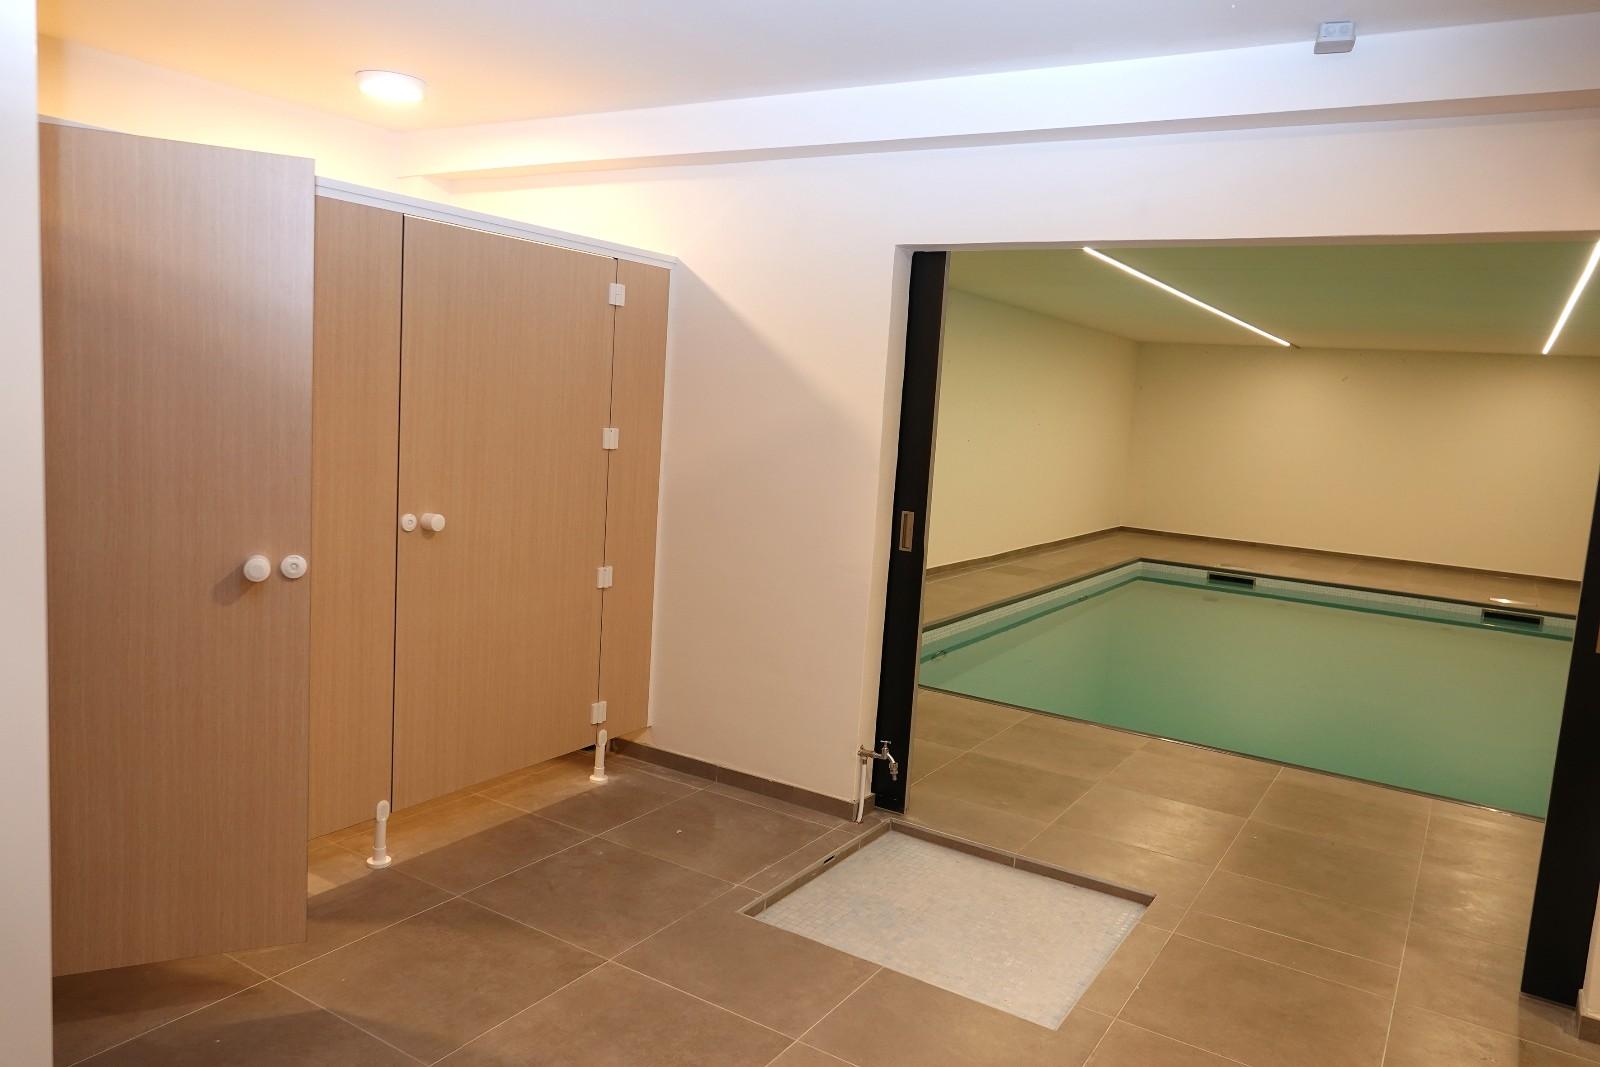 Heydeveld zwembad